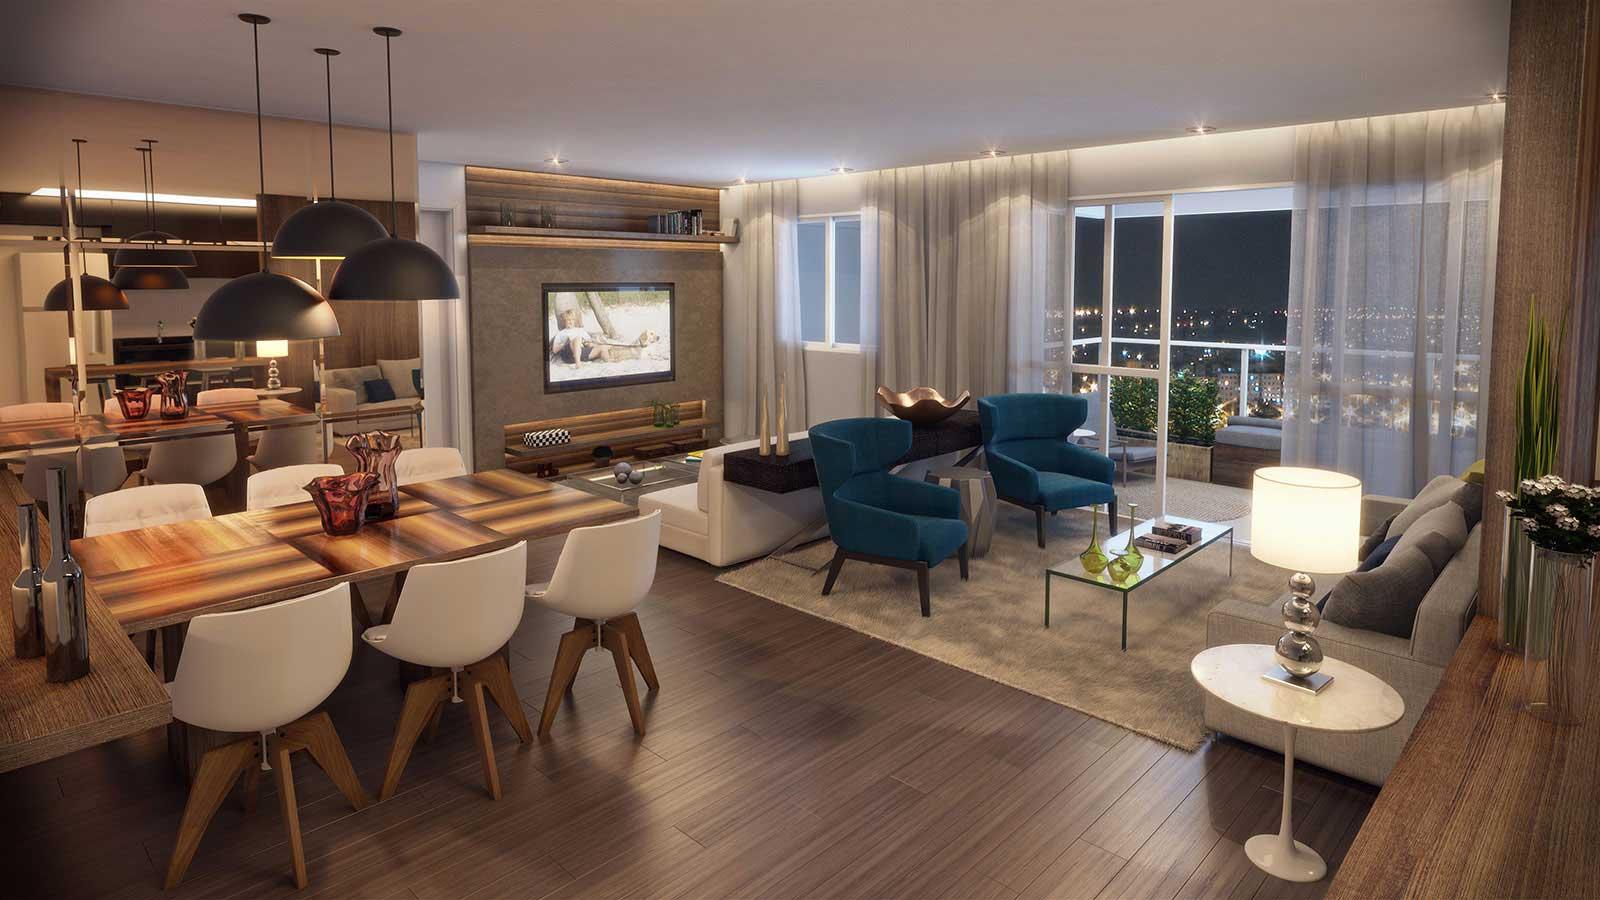 perspectiva-artistica-do-living-ampliado-de-4-dormitorios